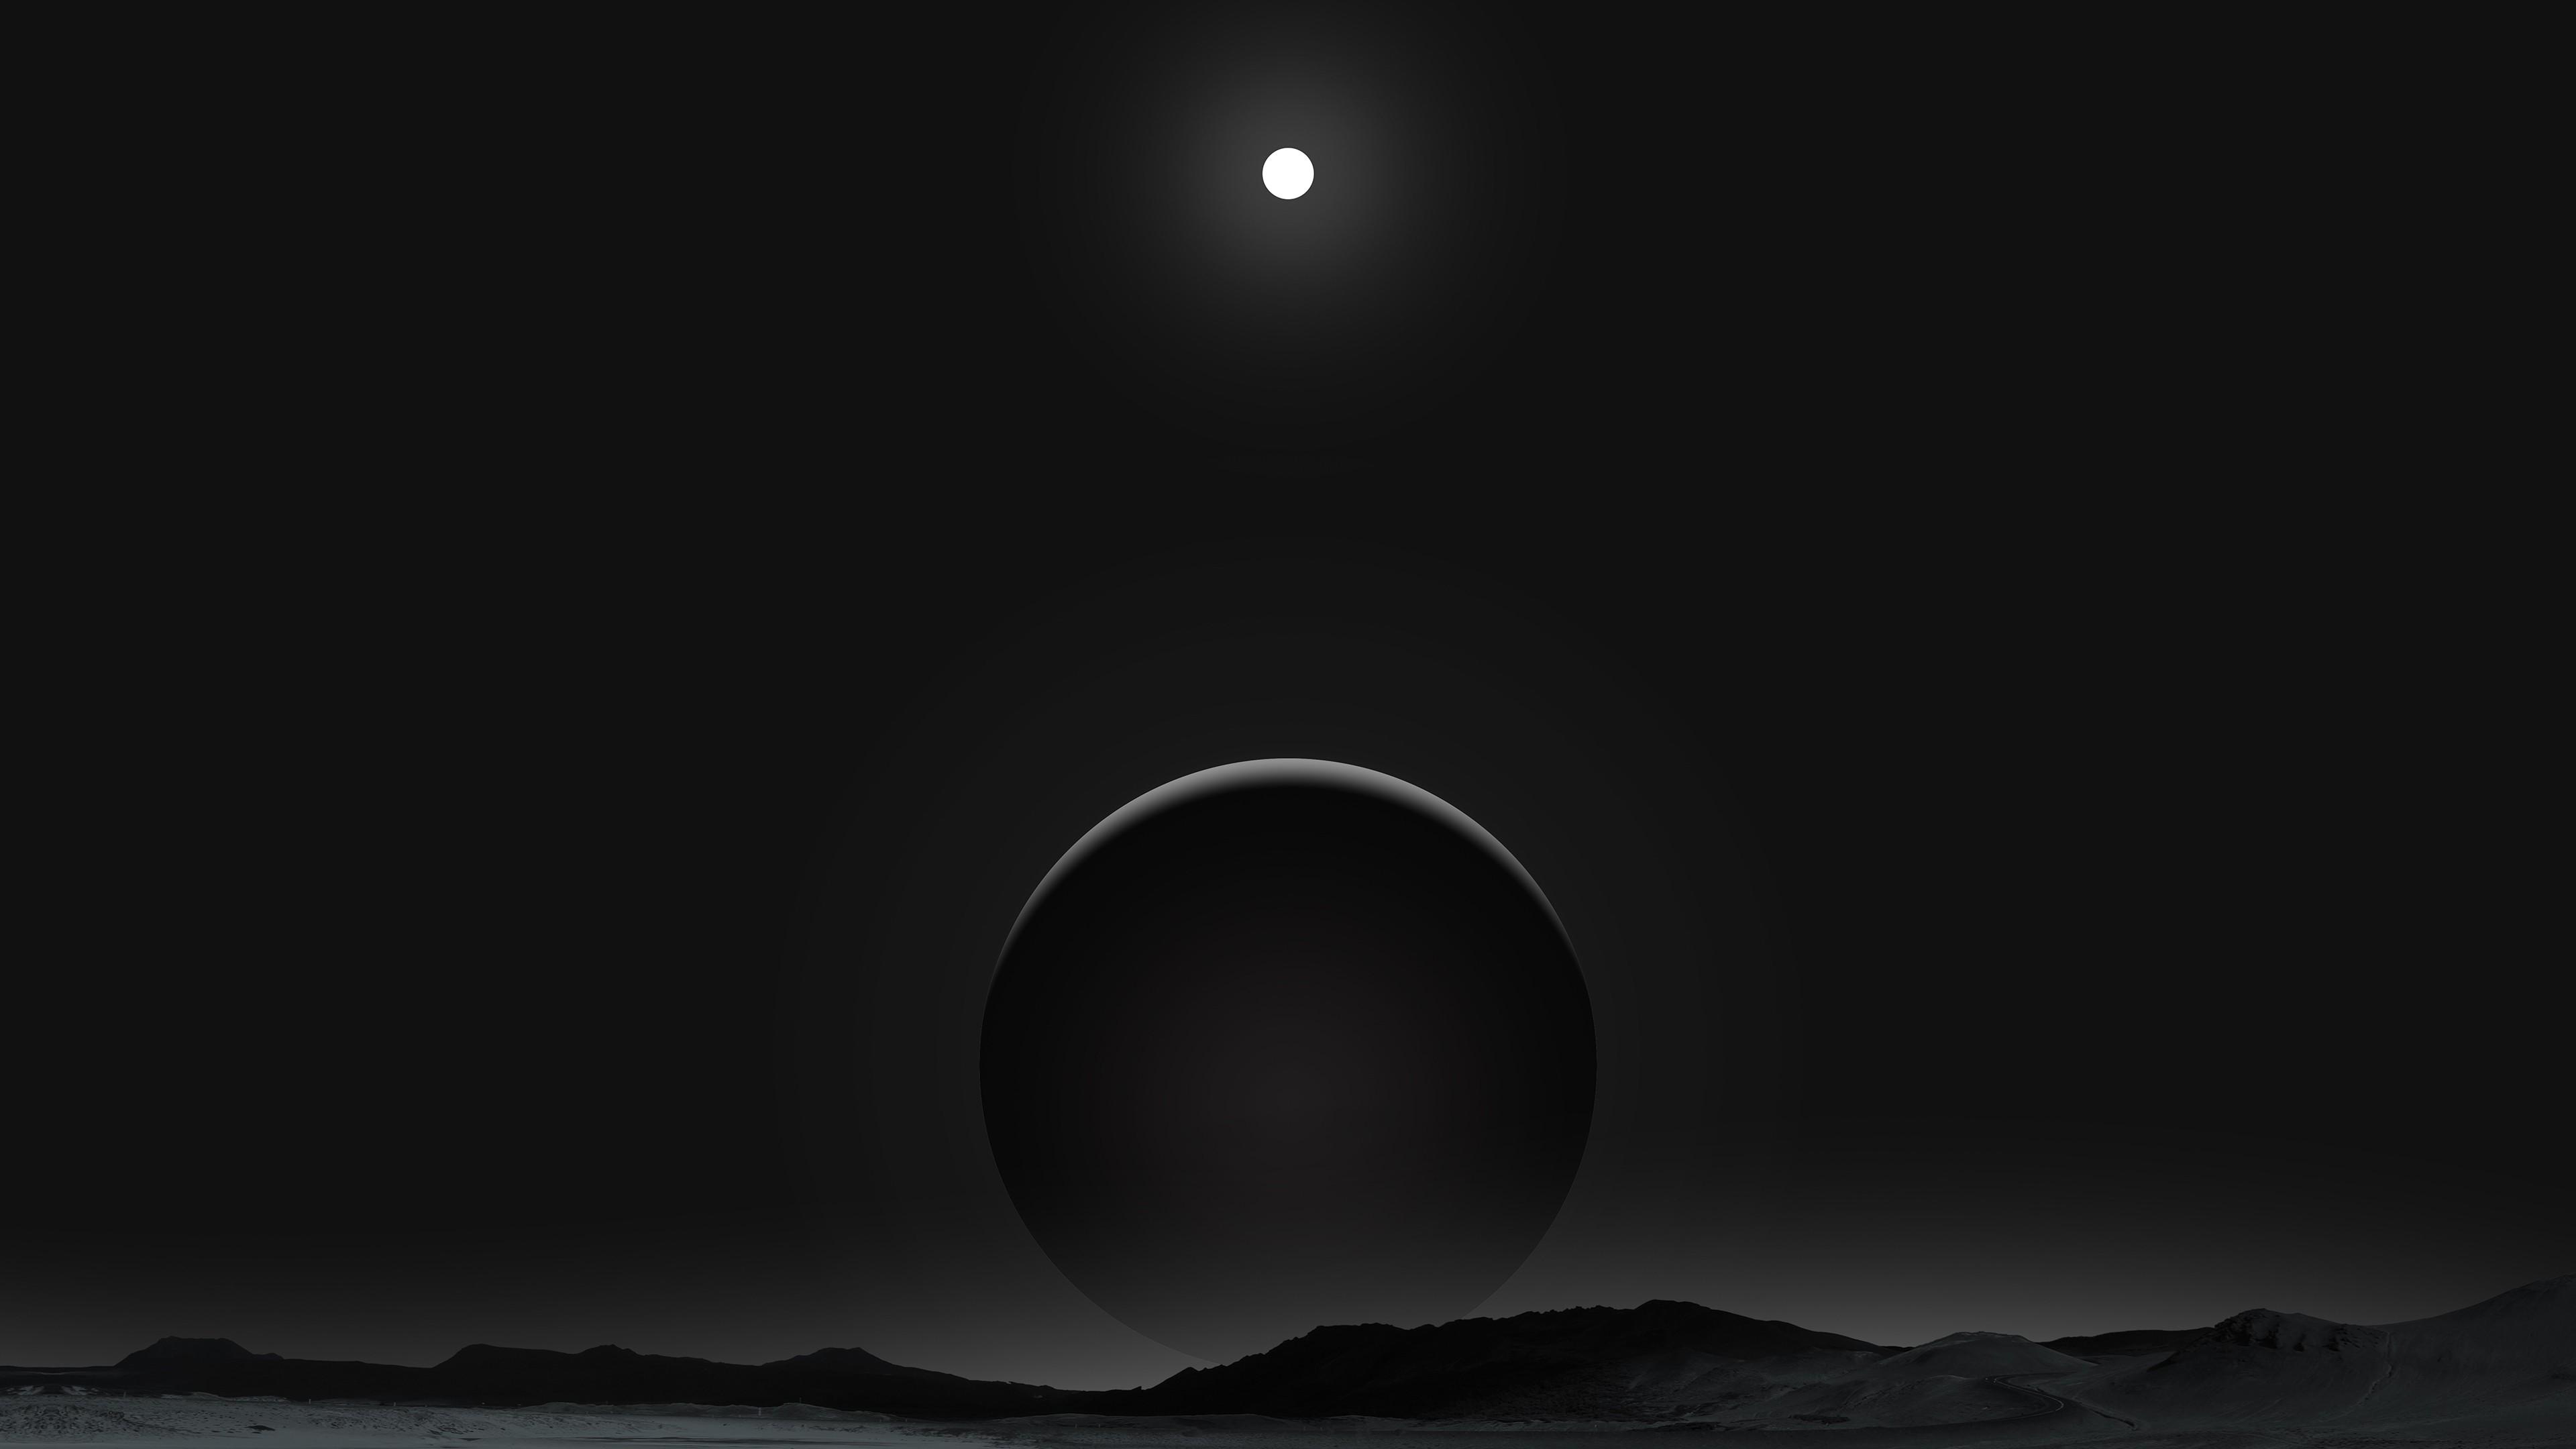 planet dark black moon 4k 1540754546 - Planet Dark Black Moon 4k - planet wallpapers, moon wallpapers, hd-wallpapers, digital art wallpapers, dark wallpapers, artwork wallpapers, artist wallpapers, 4k-wallpapers